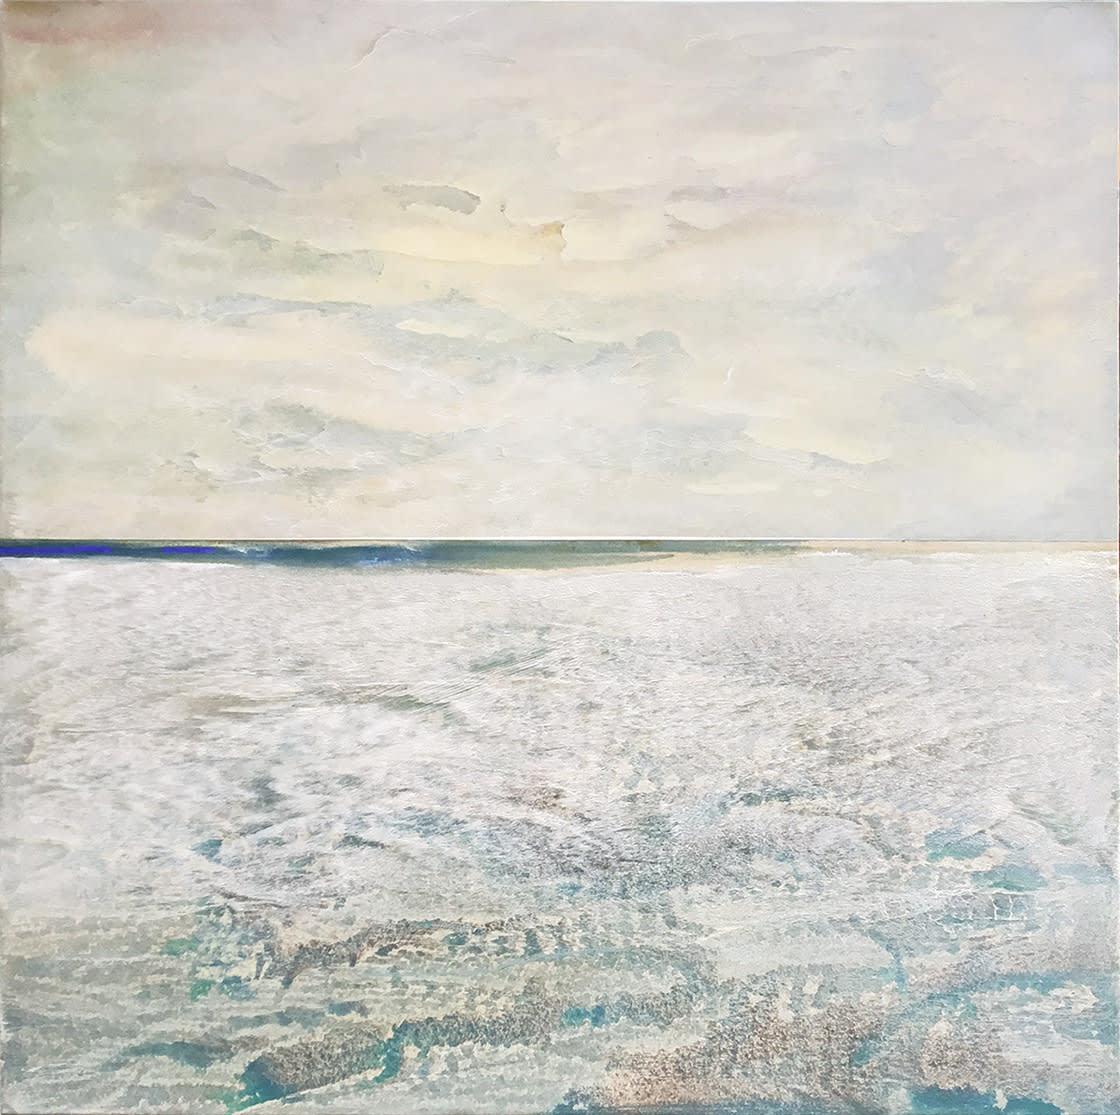 Vanishing Point, 2020 by Sasha Rogers at Kostuik Gallery